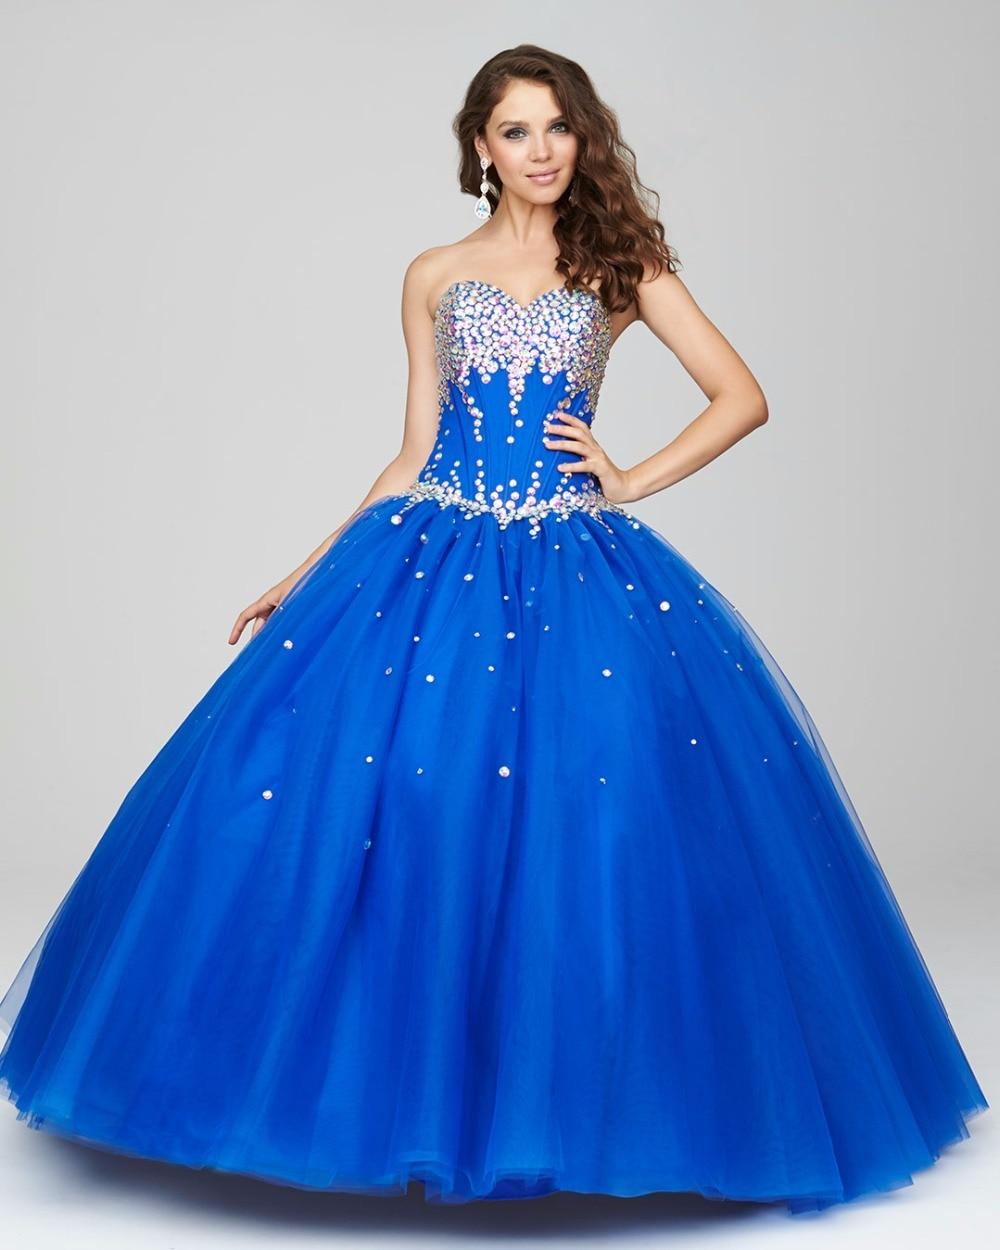 R7164 10 De Descontoazul Royal Vestido De Baile Vestidos De Baile 2017 Cristais Namorada Adolescentes Vestidos De Festa Formal Prom Vestidos